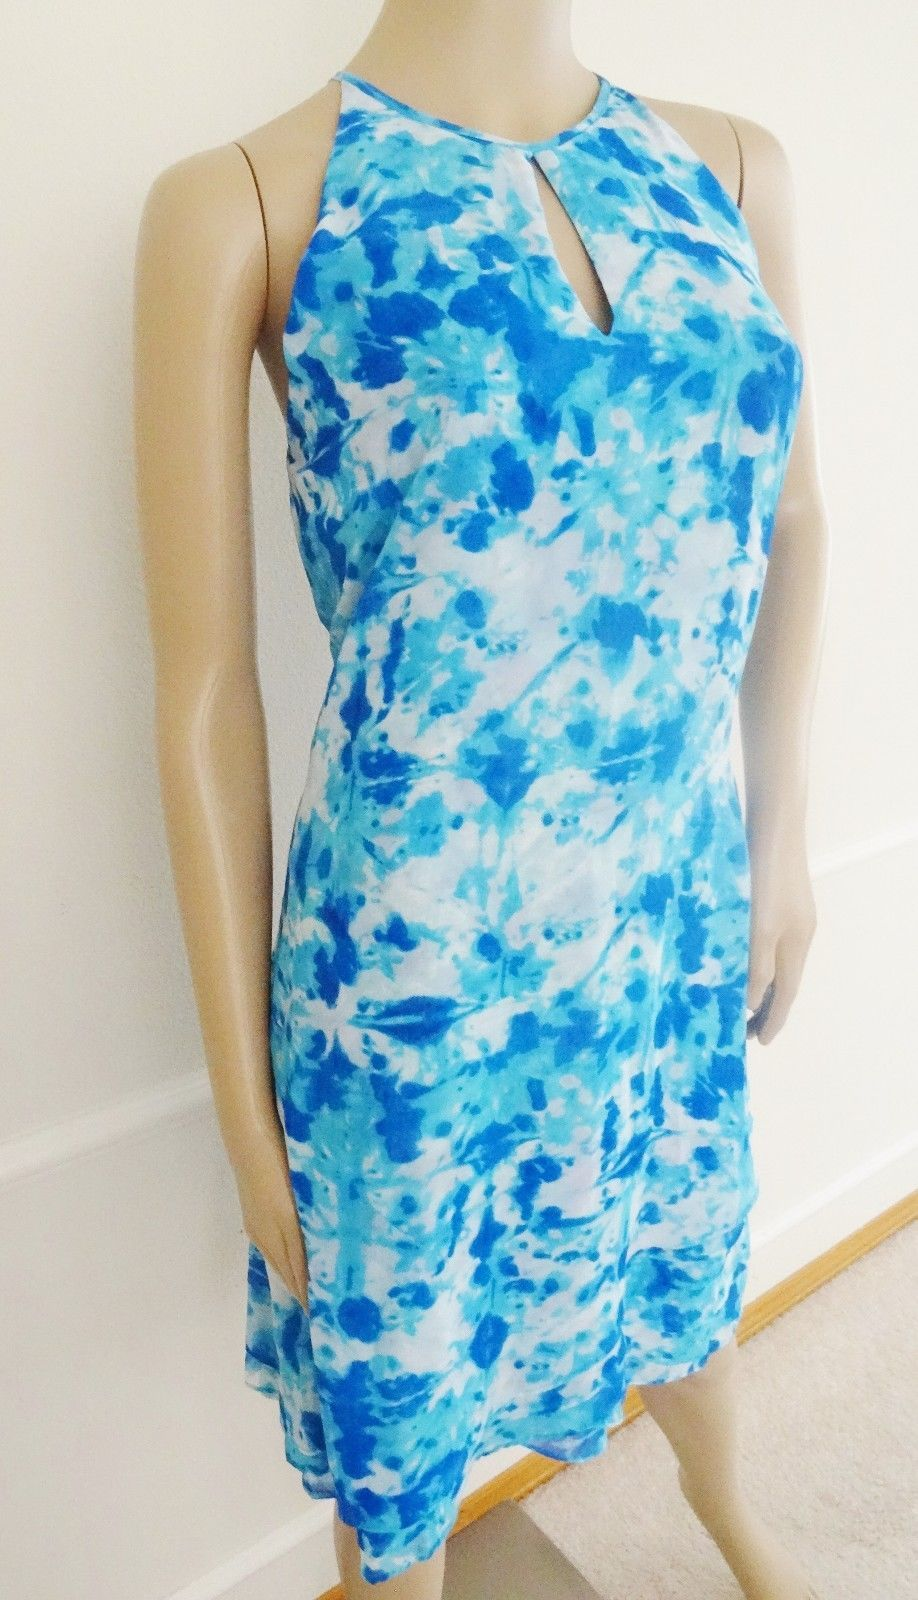 Nwt Calvin Klein Keyhole Halter Chiffon Flare Tiered Dress Sz 12 Blue Print $134